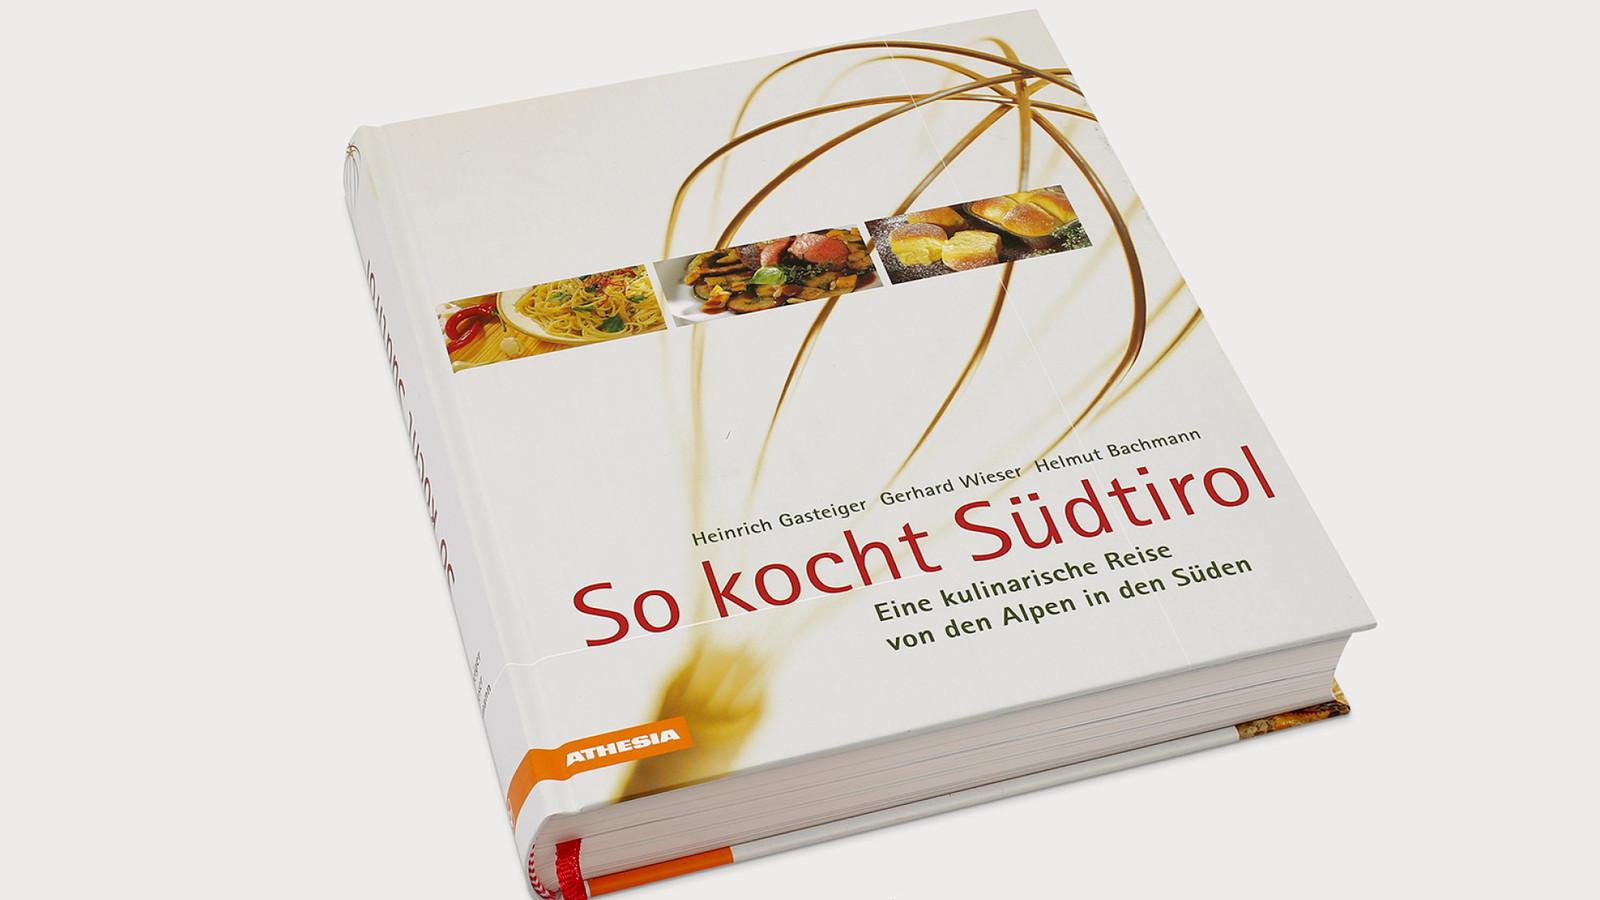 Kochbuch - Athesia Verlagsanstalt